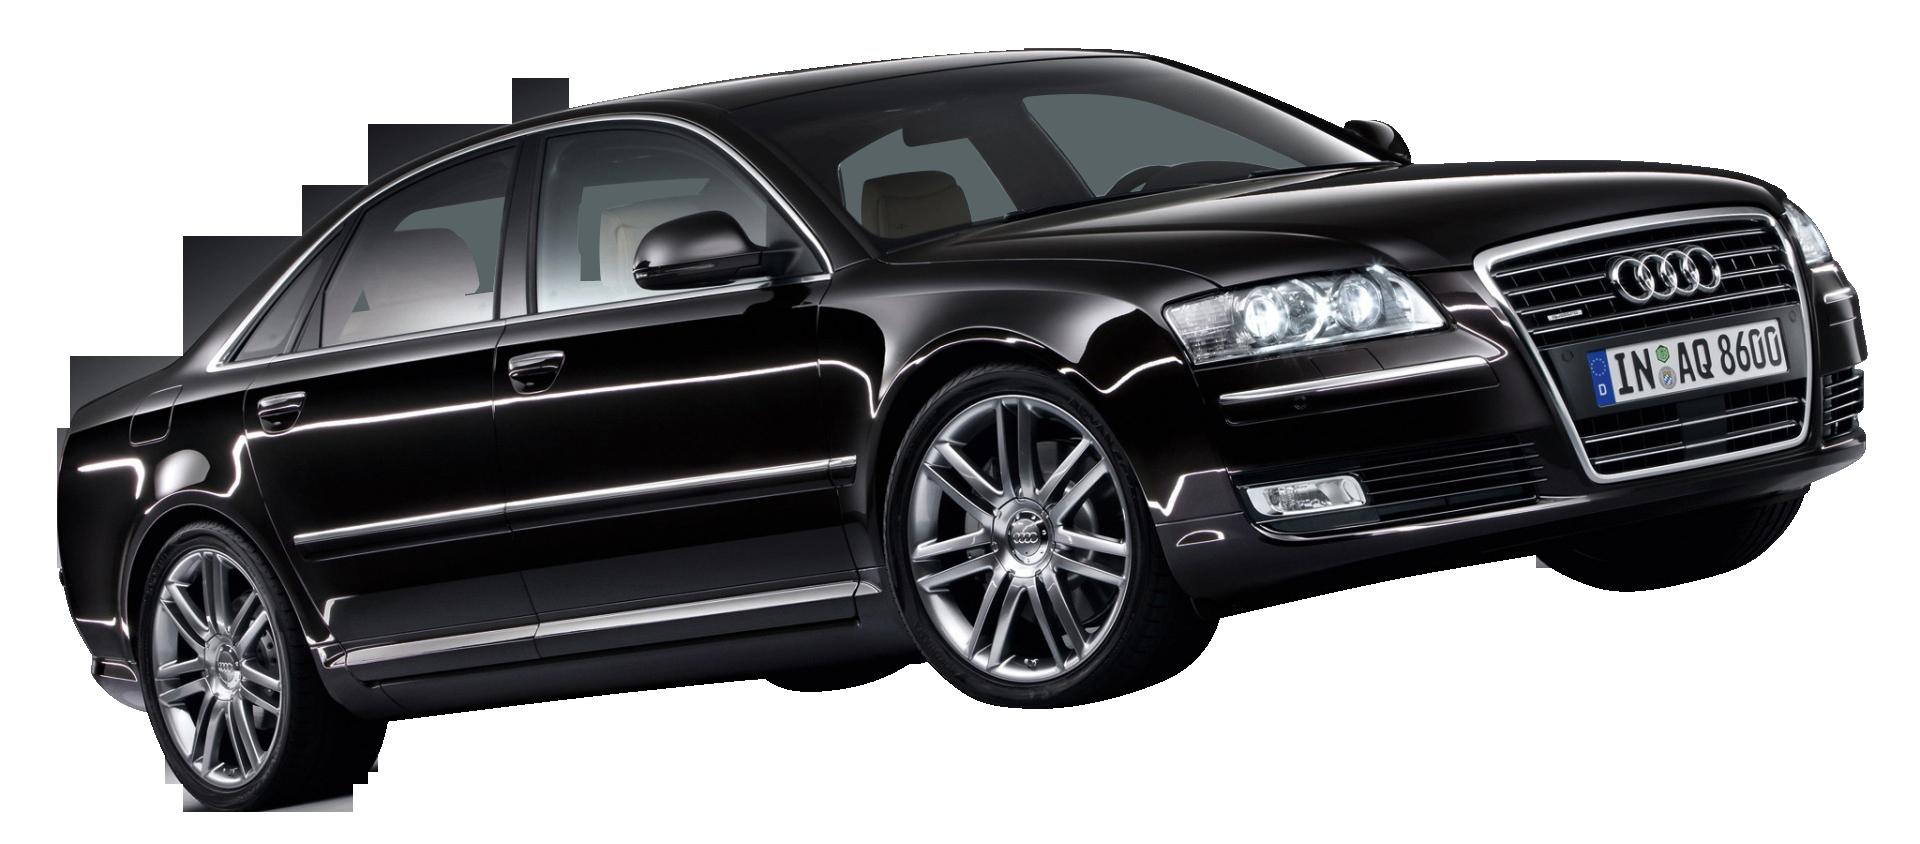 Black Audi A8 Car PNG Image